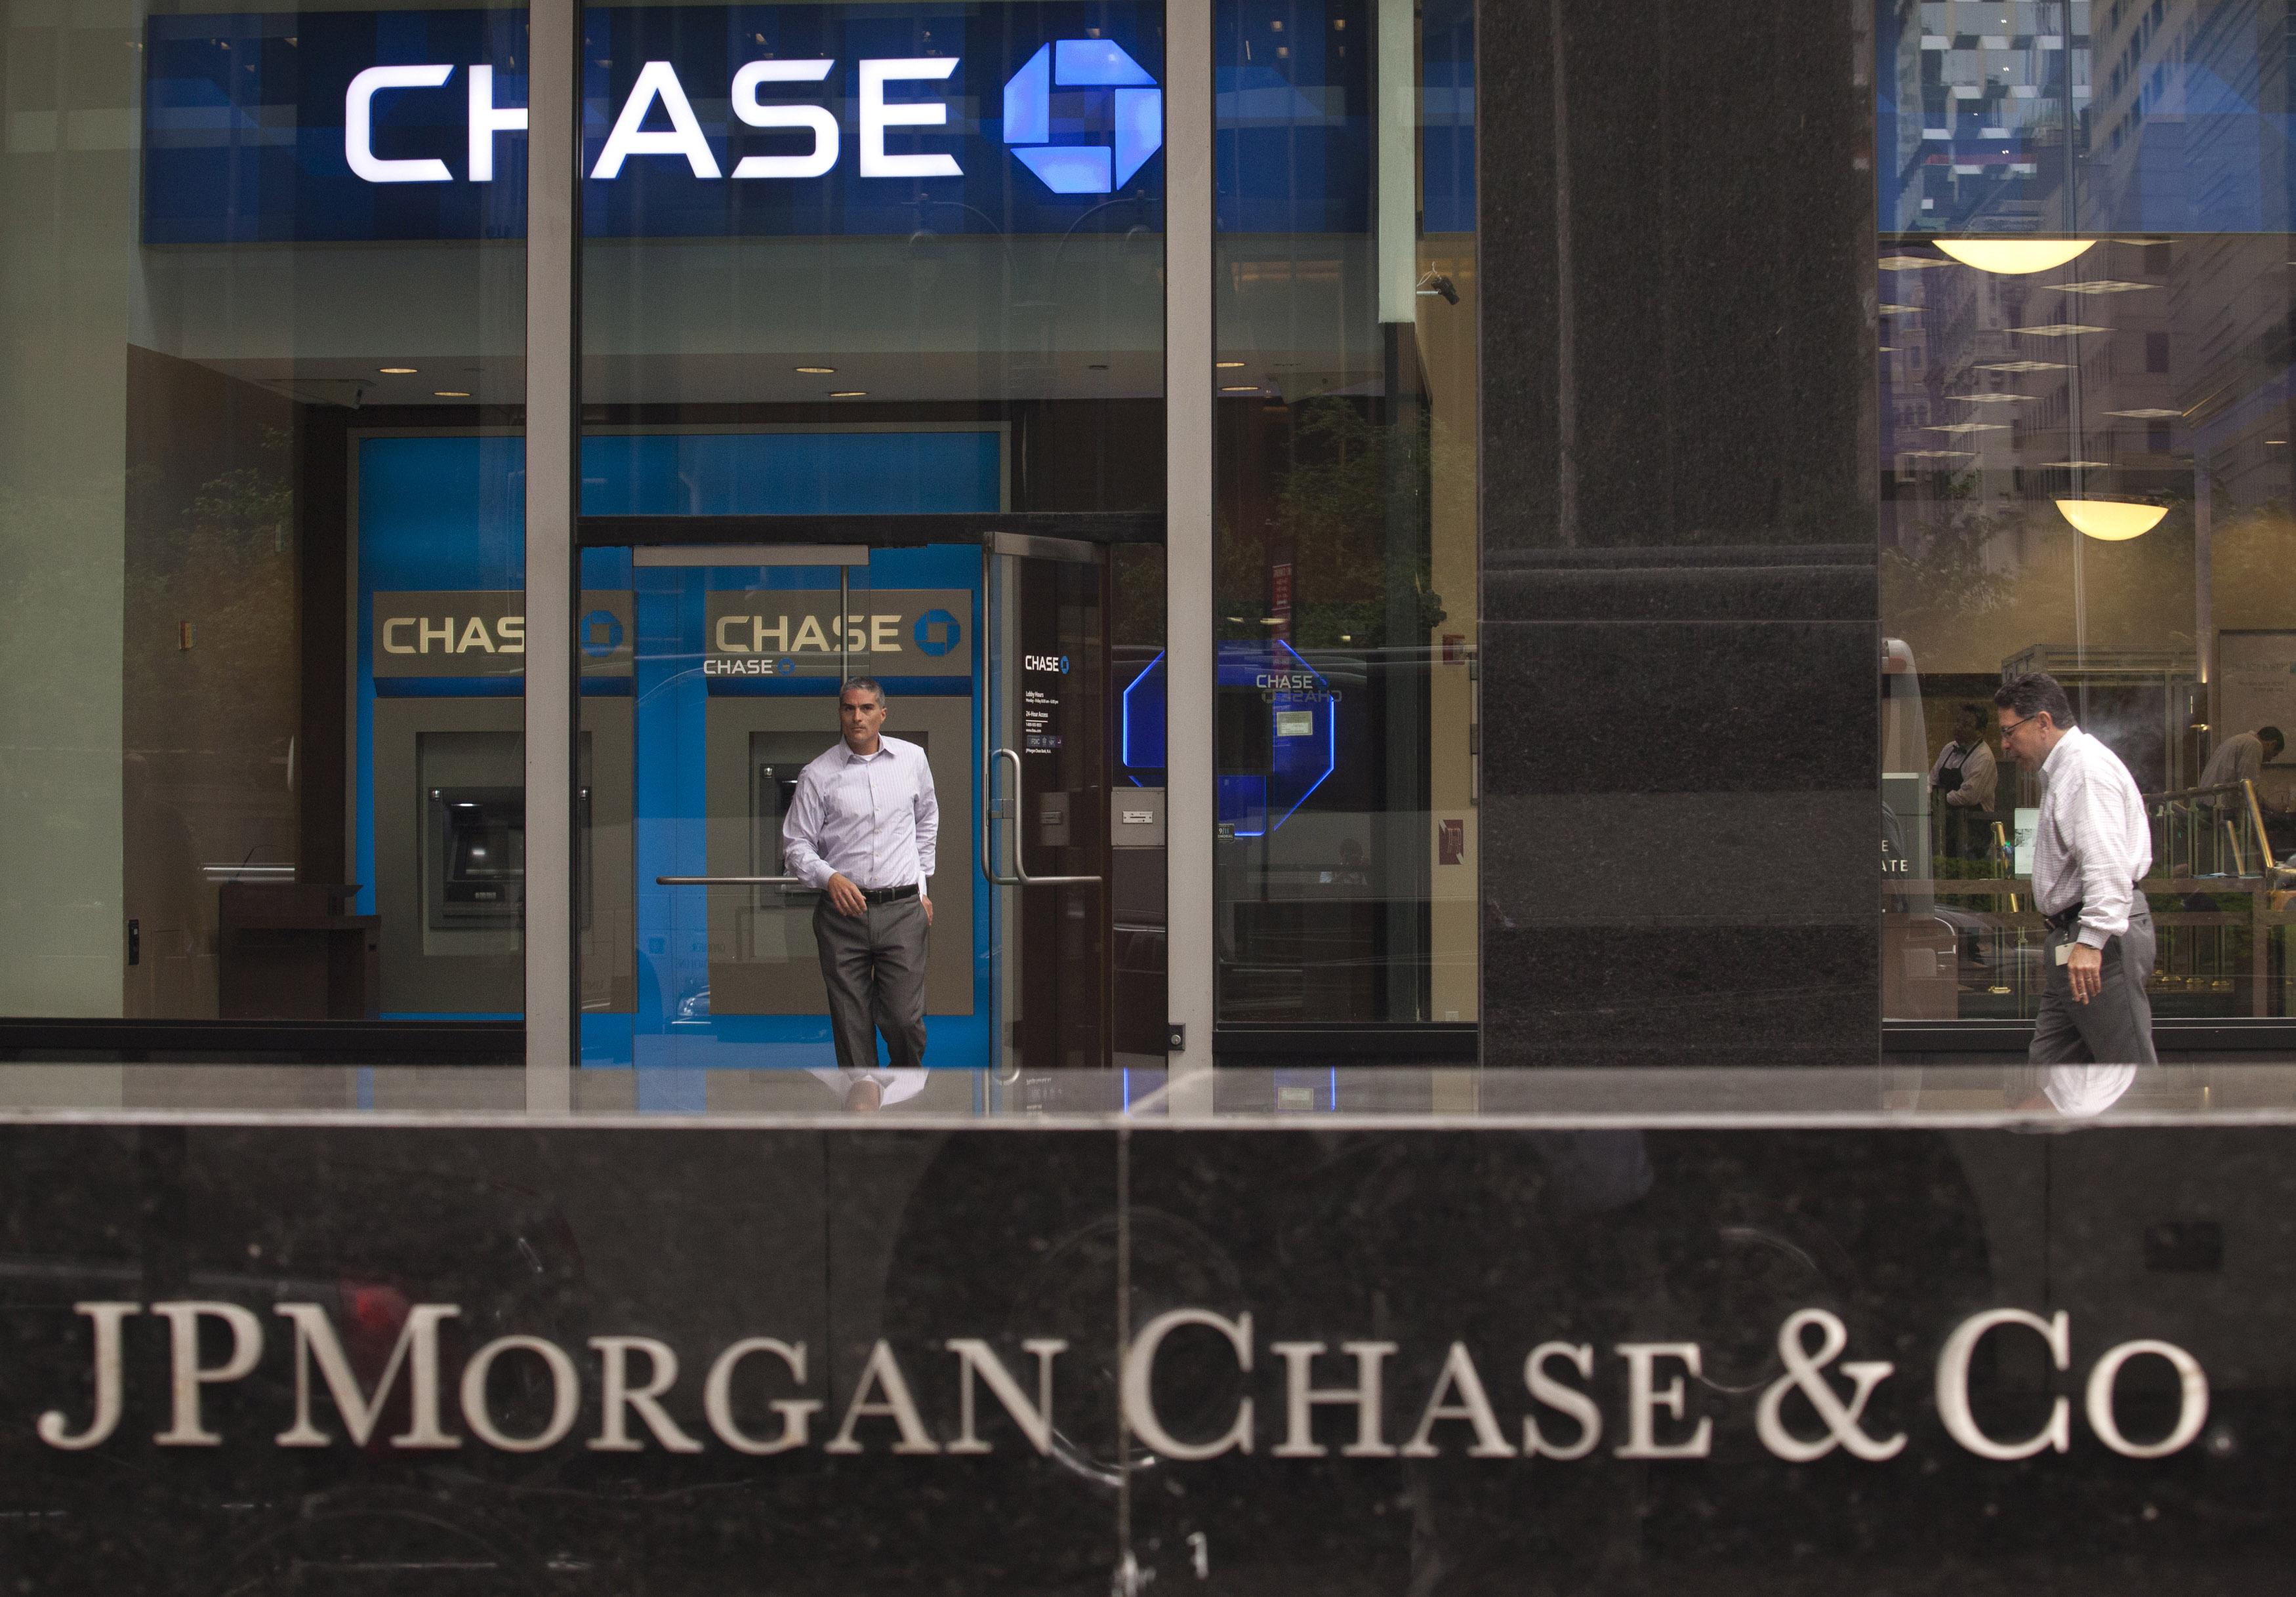 JPMorgan blockchain idea is far from a killer app